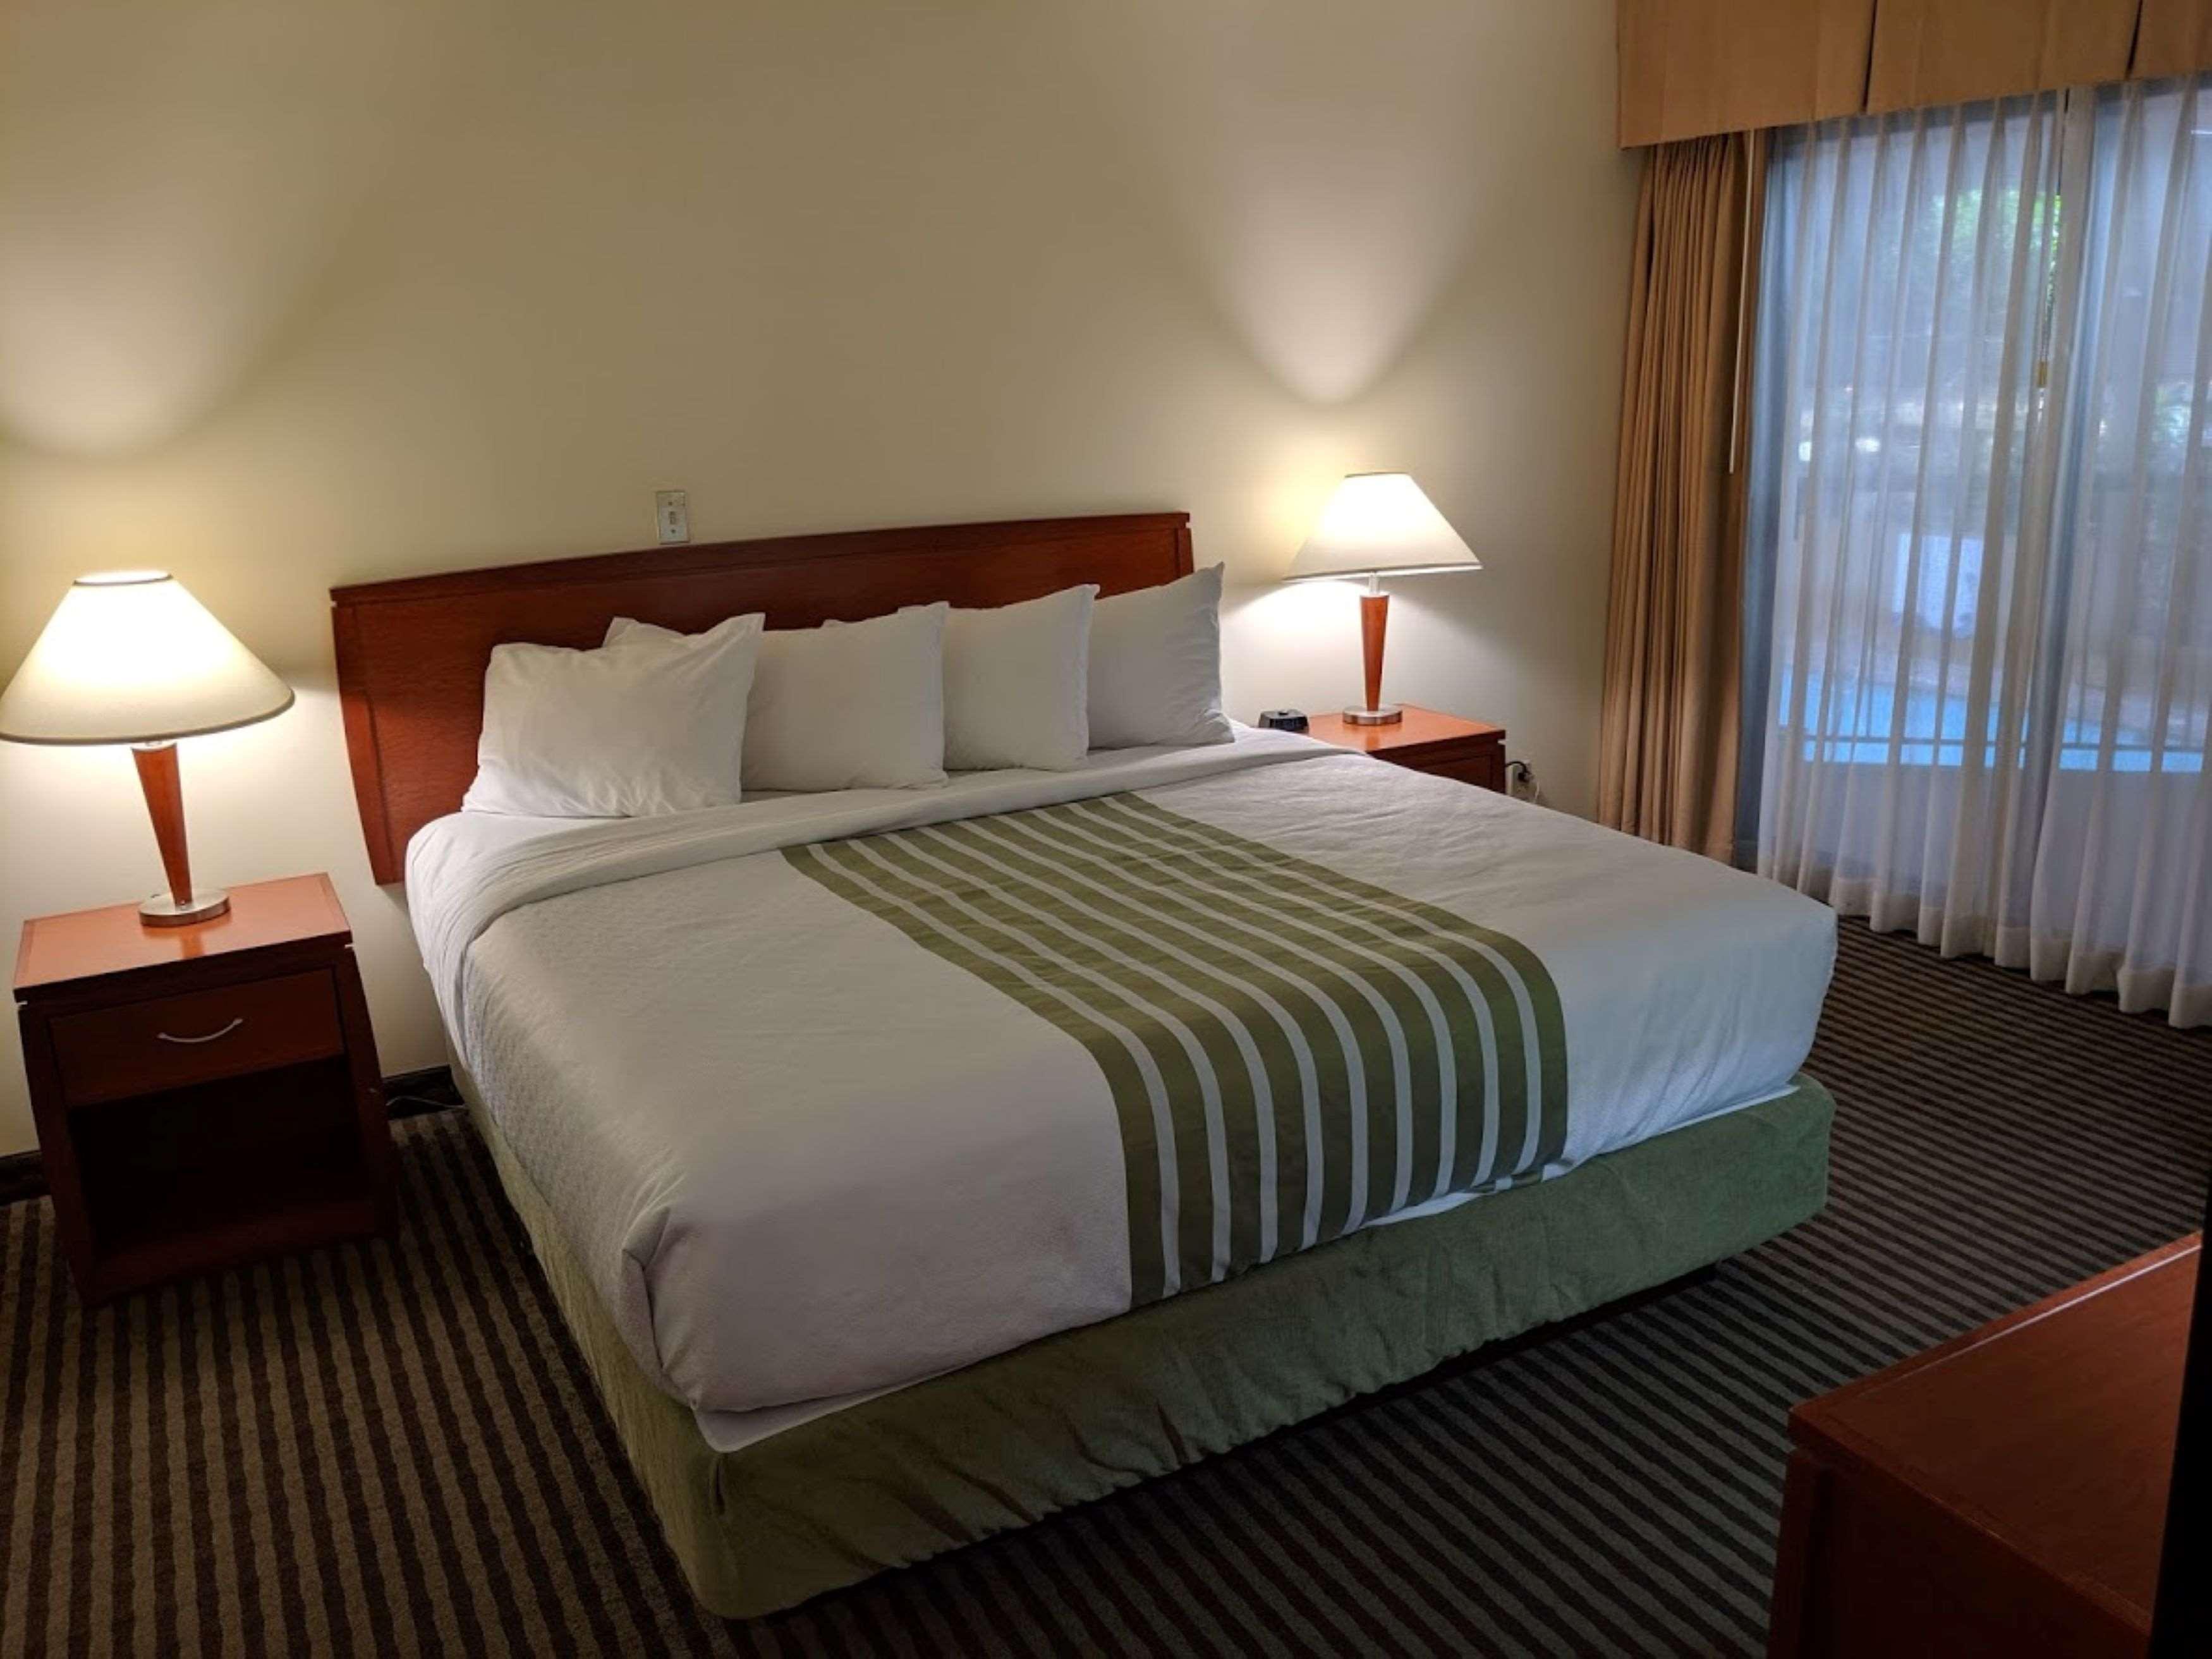 Surestay Hotel By Best Western Chilliwack in Chilliwack: King Suite Atrium Bedroom